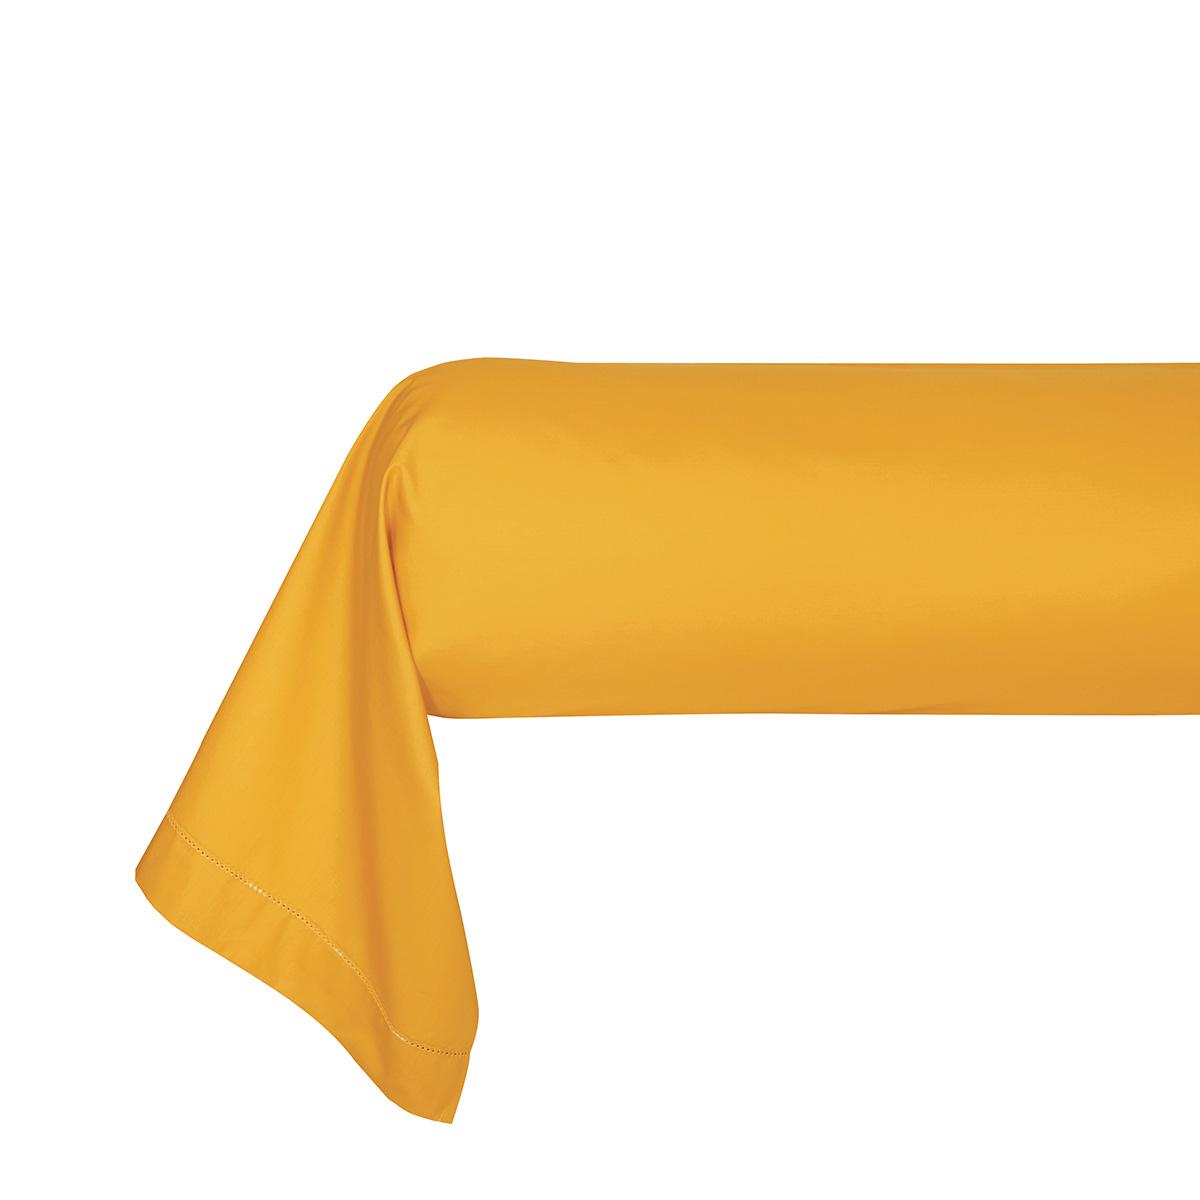 Taie d'oreiller percale Orange 85 x 210 cm